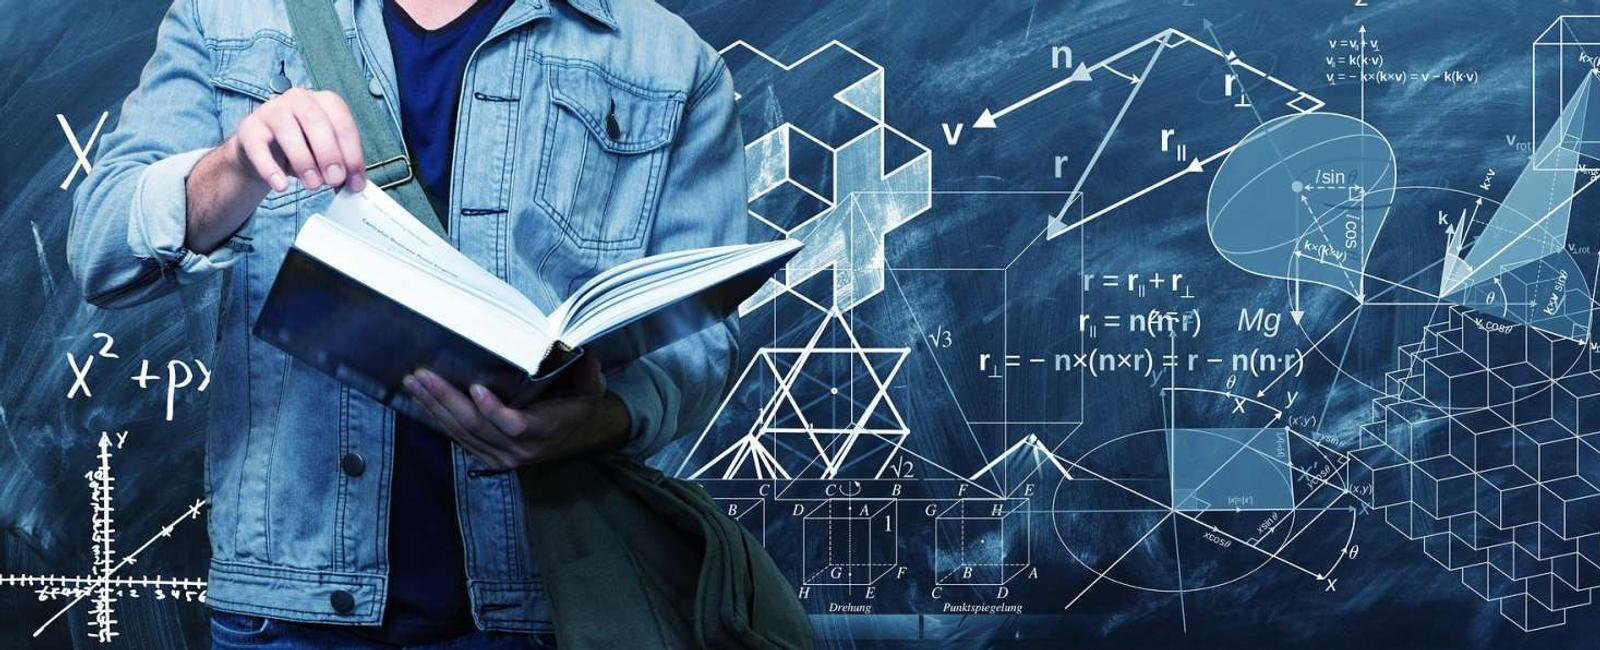 Manuale școlare digitalizate (Republica Moldova)